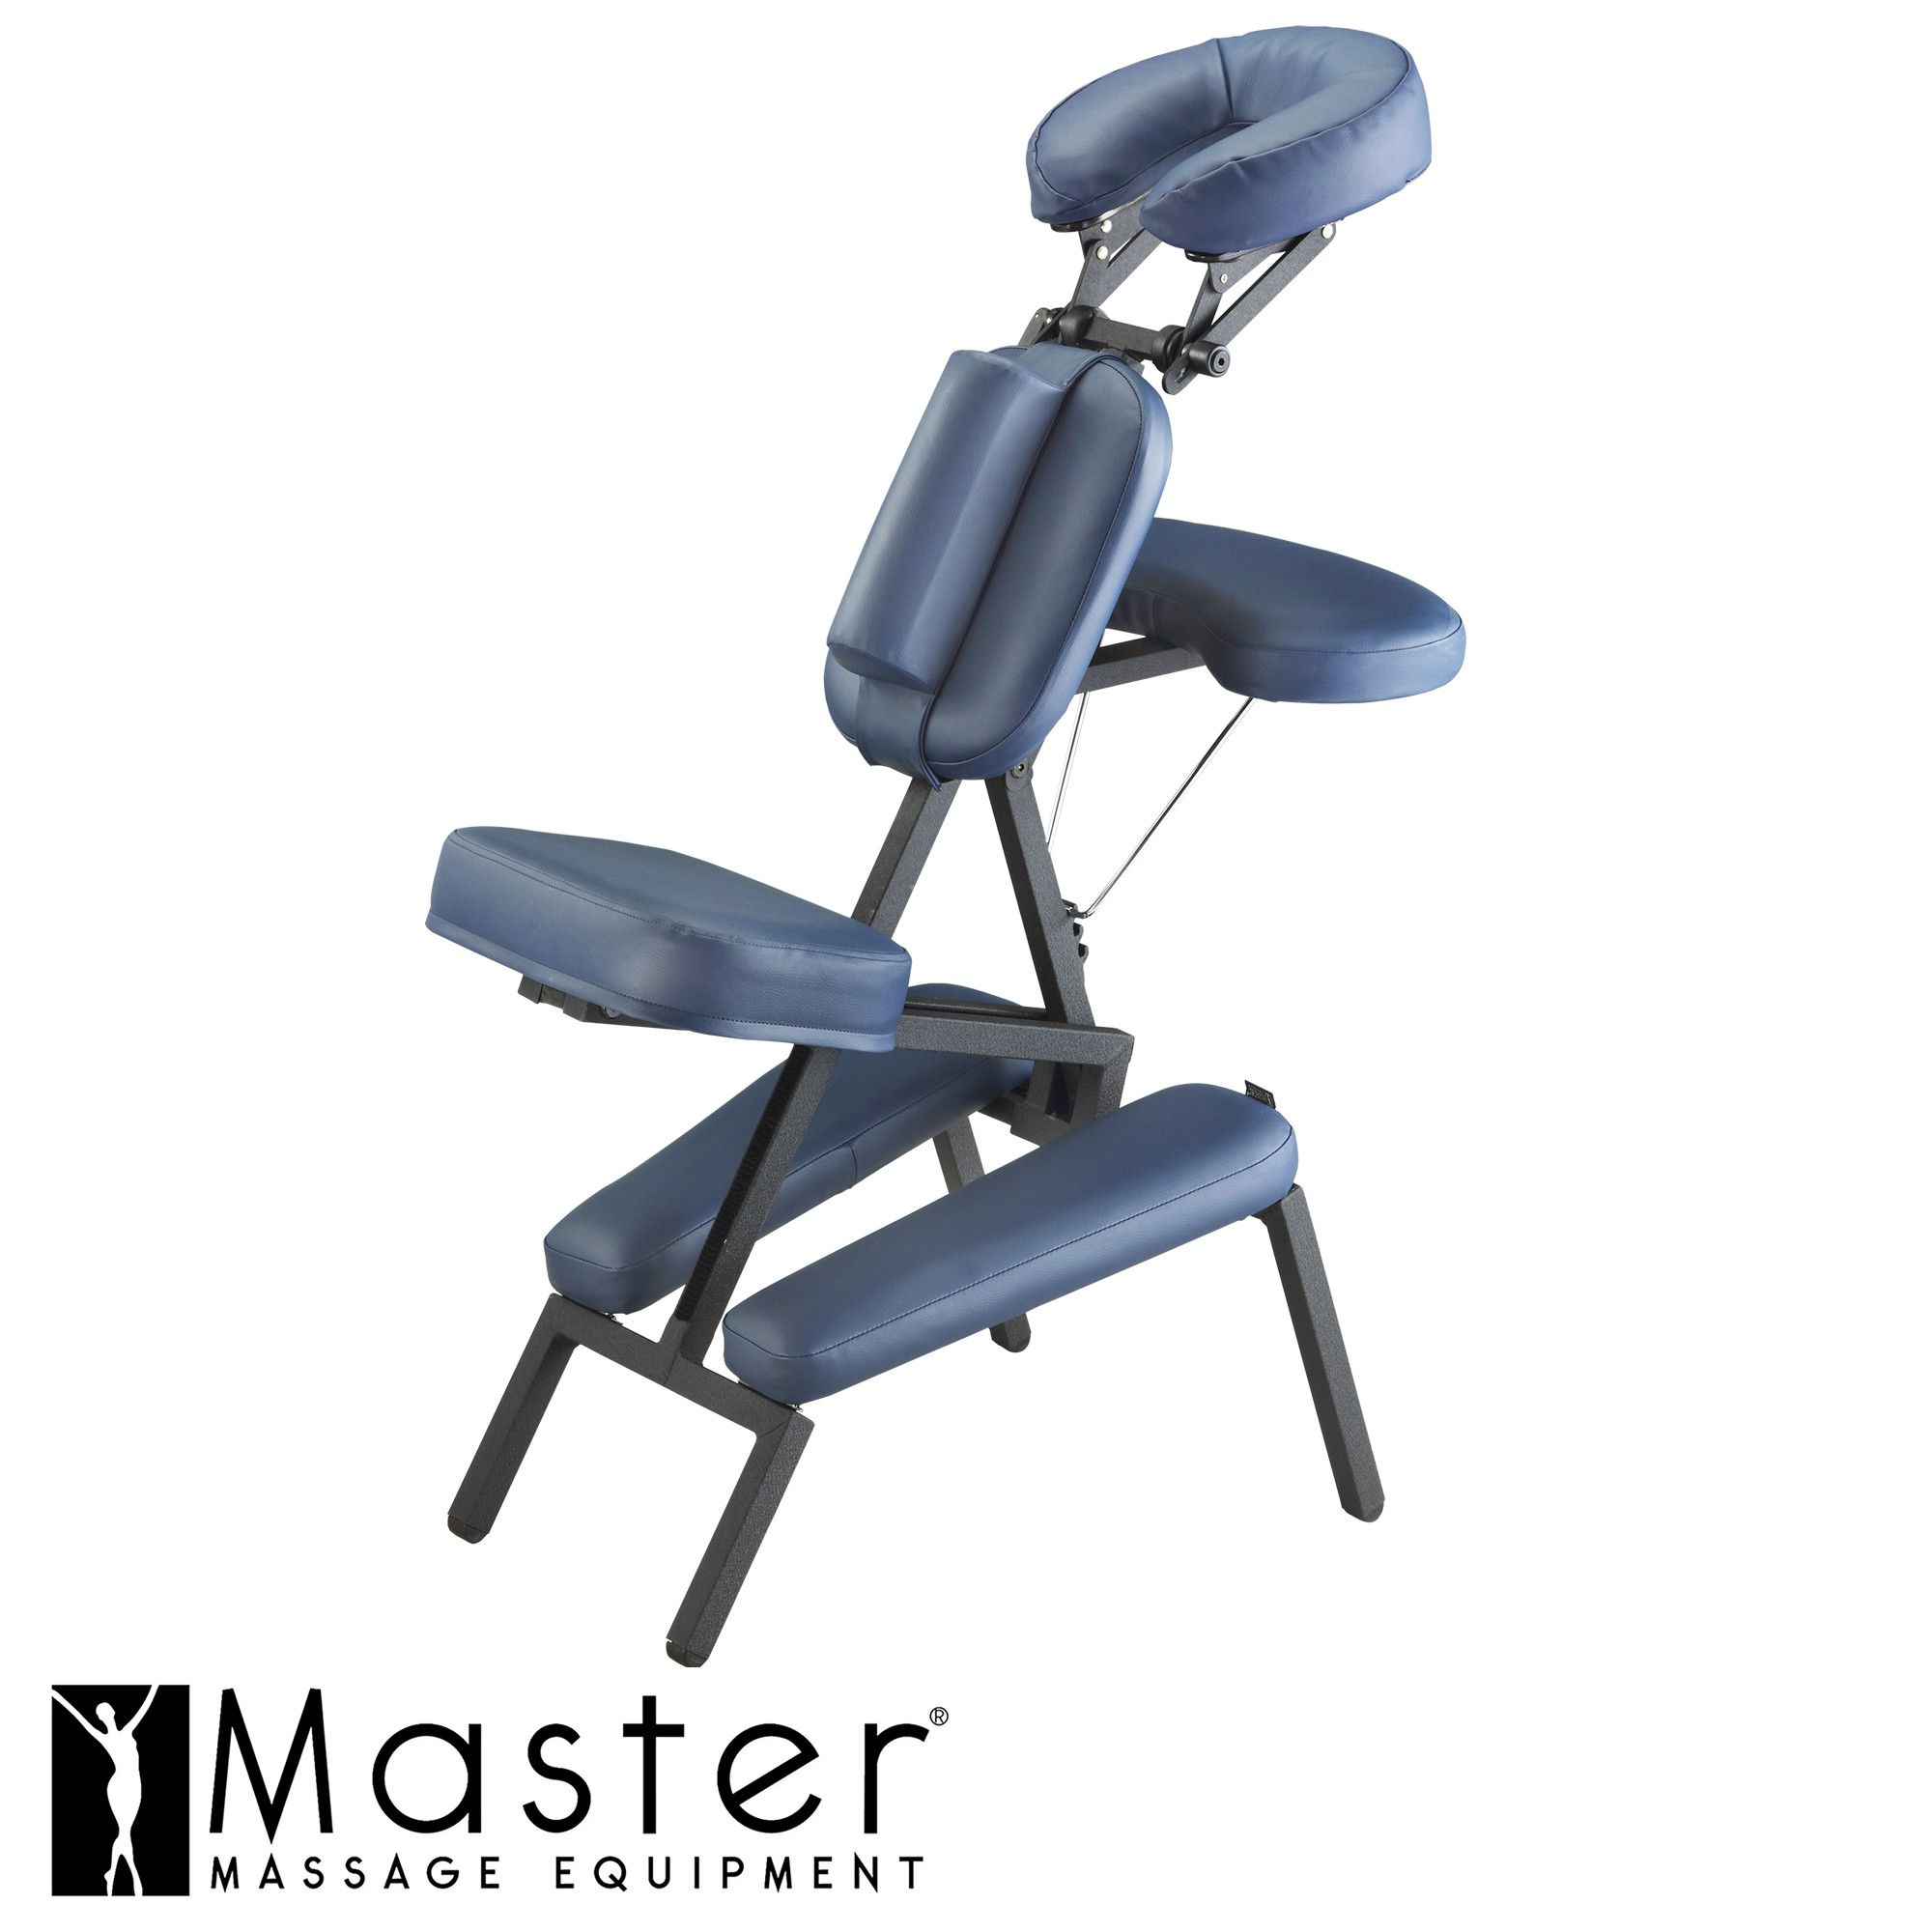 Master Professional Portable Tattoo Salon Massage Chair